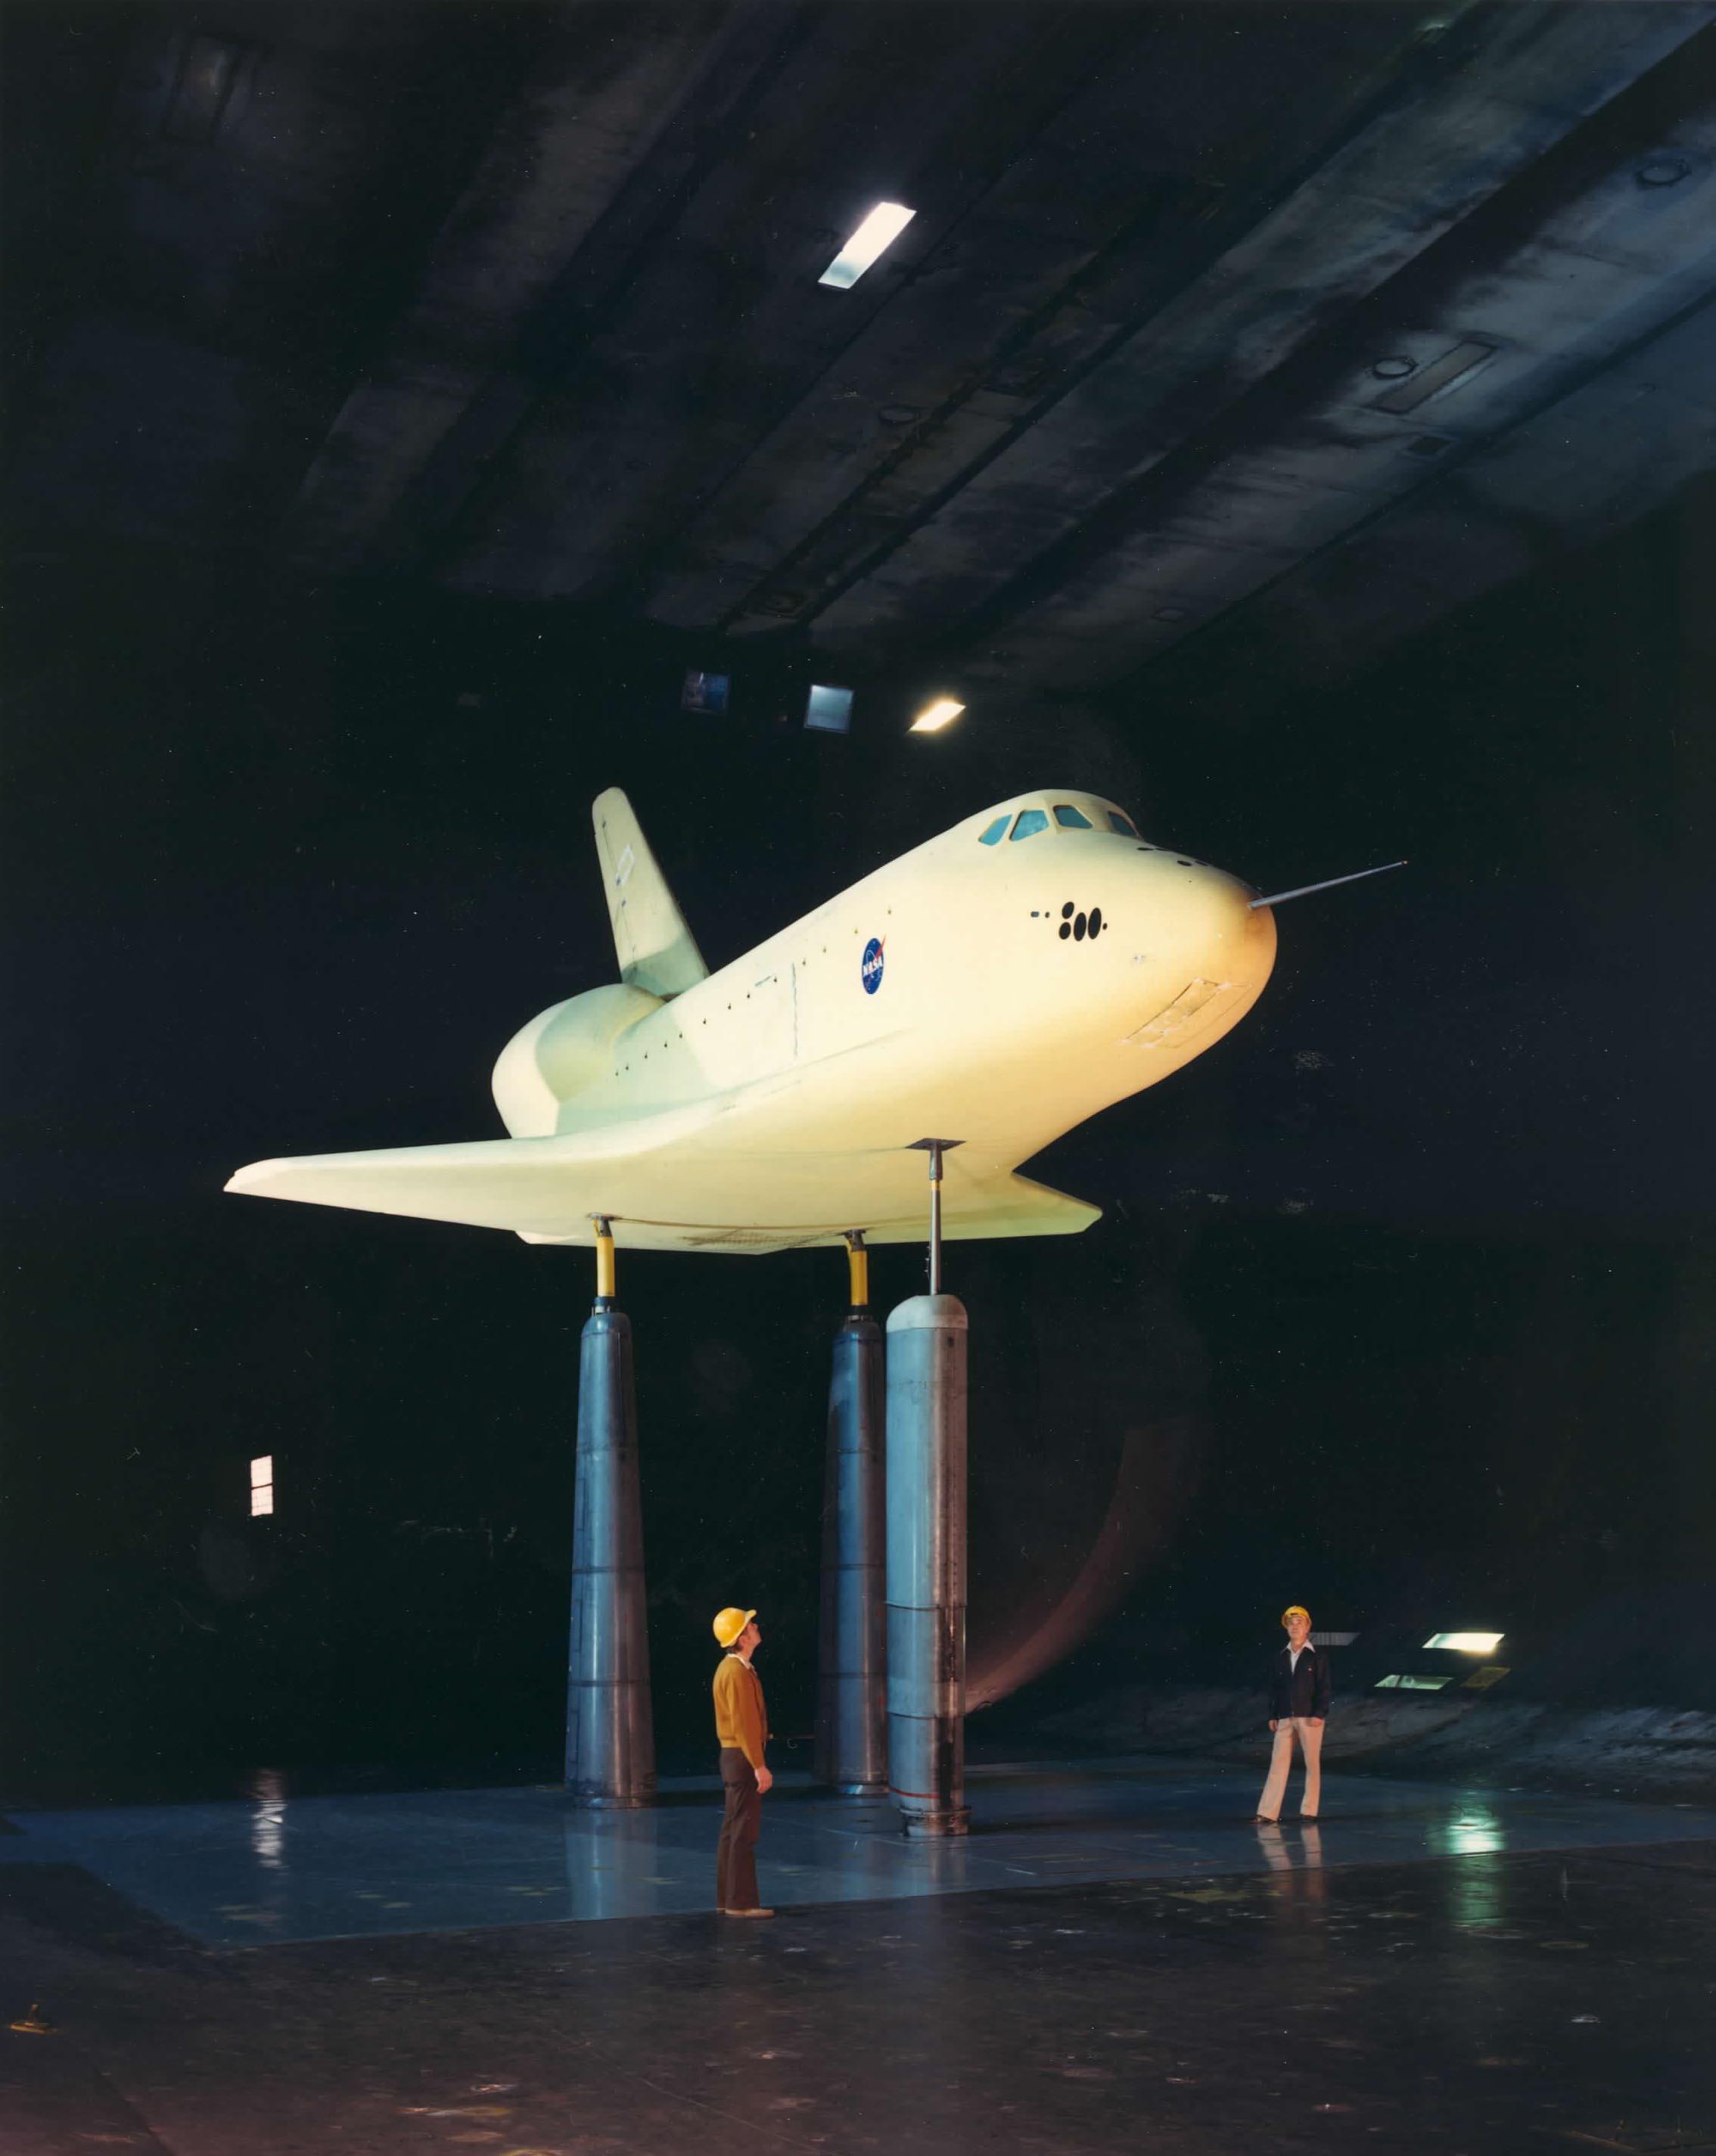 space shuttle aerodynamics - photo #1